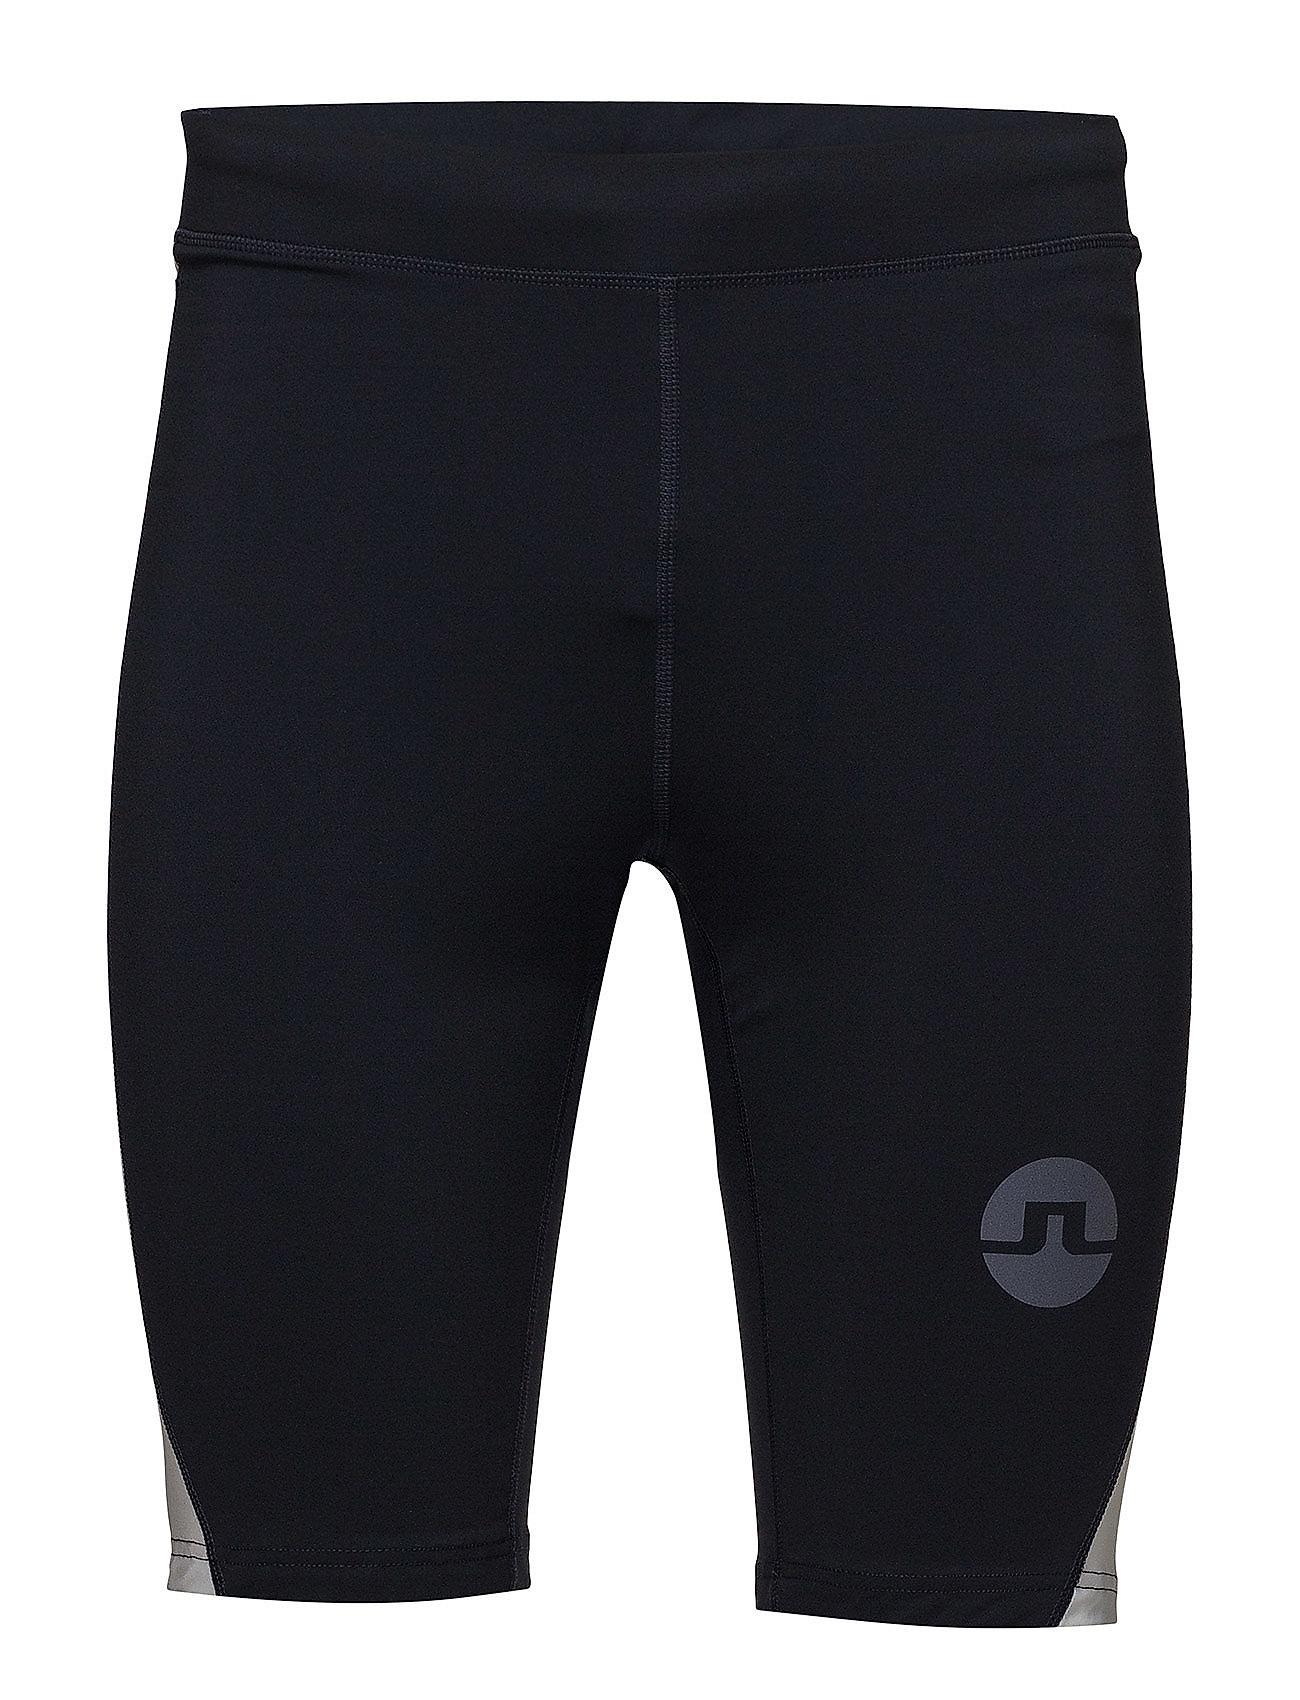 J. Lindeberg M Dean Short Comp Poly Shorts